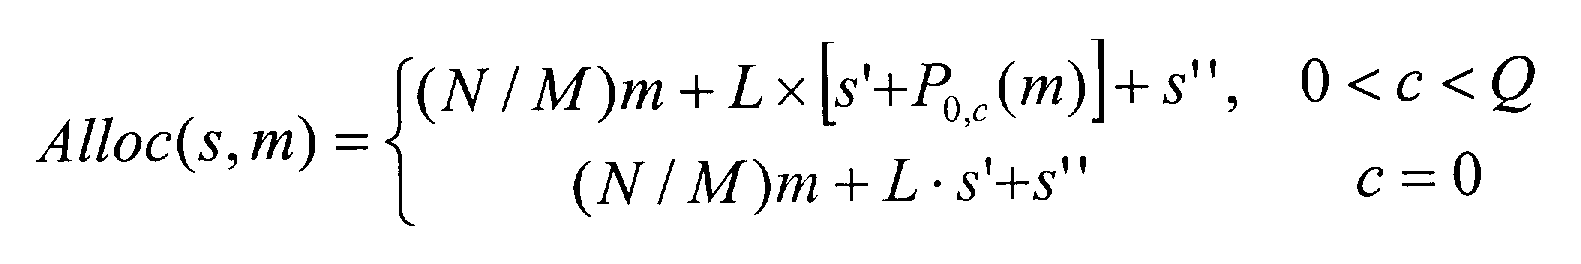 Figure 112004010452112-pat00004